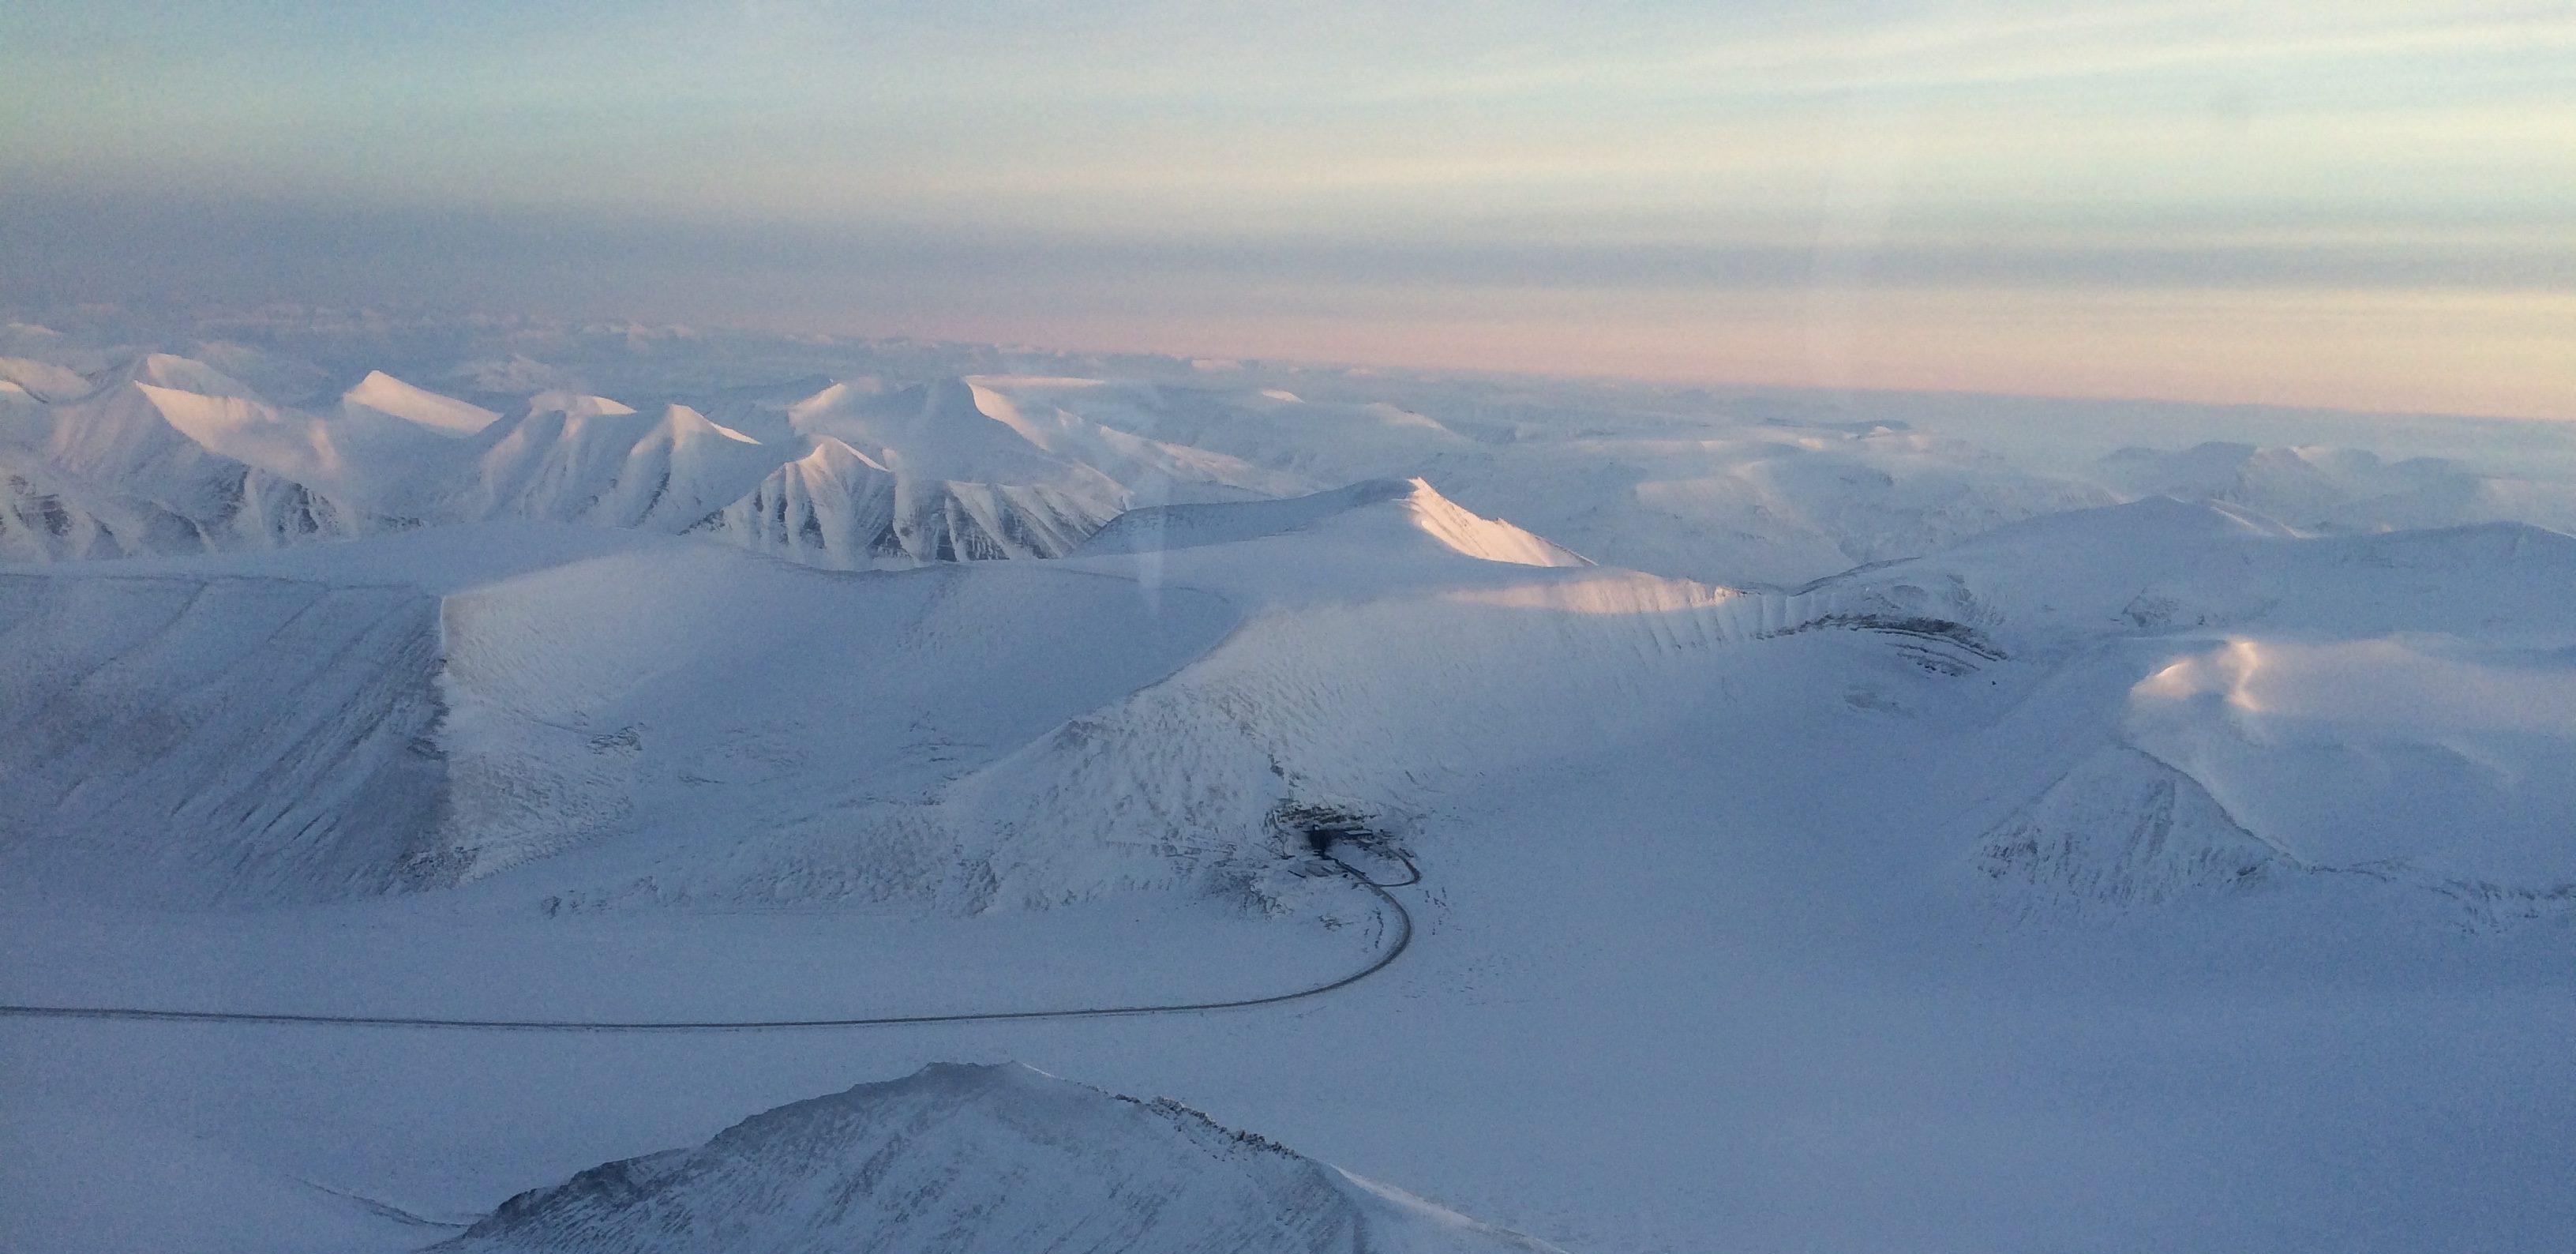 Flyfoto Lunckefjell og veien over Marthabreen